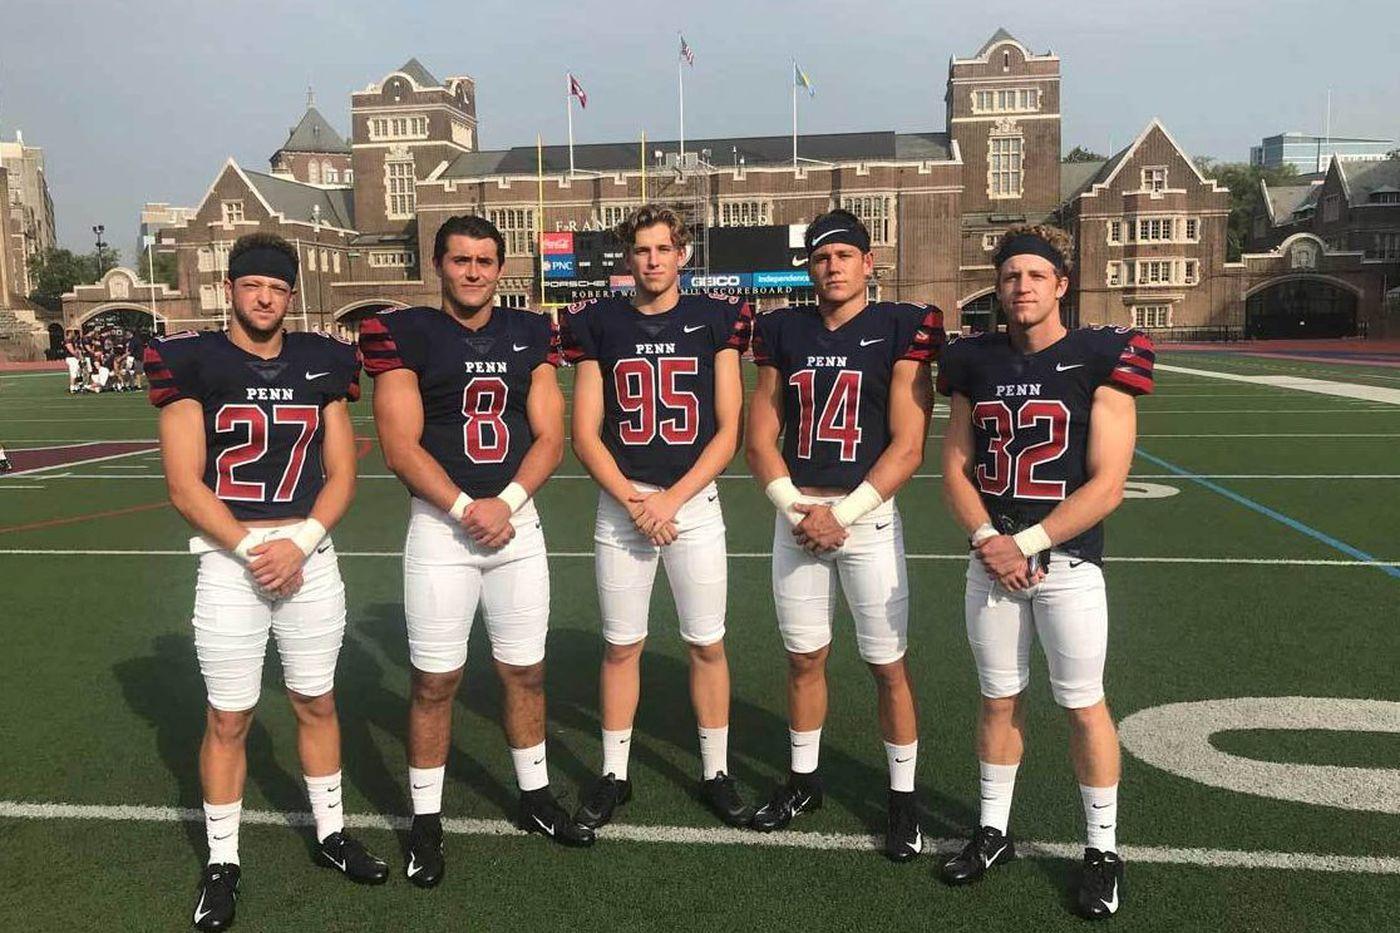 Five high school teammates ride a cross-country pipeline to Penn | Football season preview